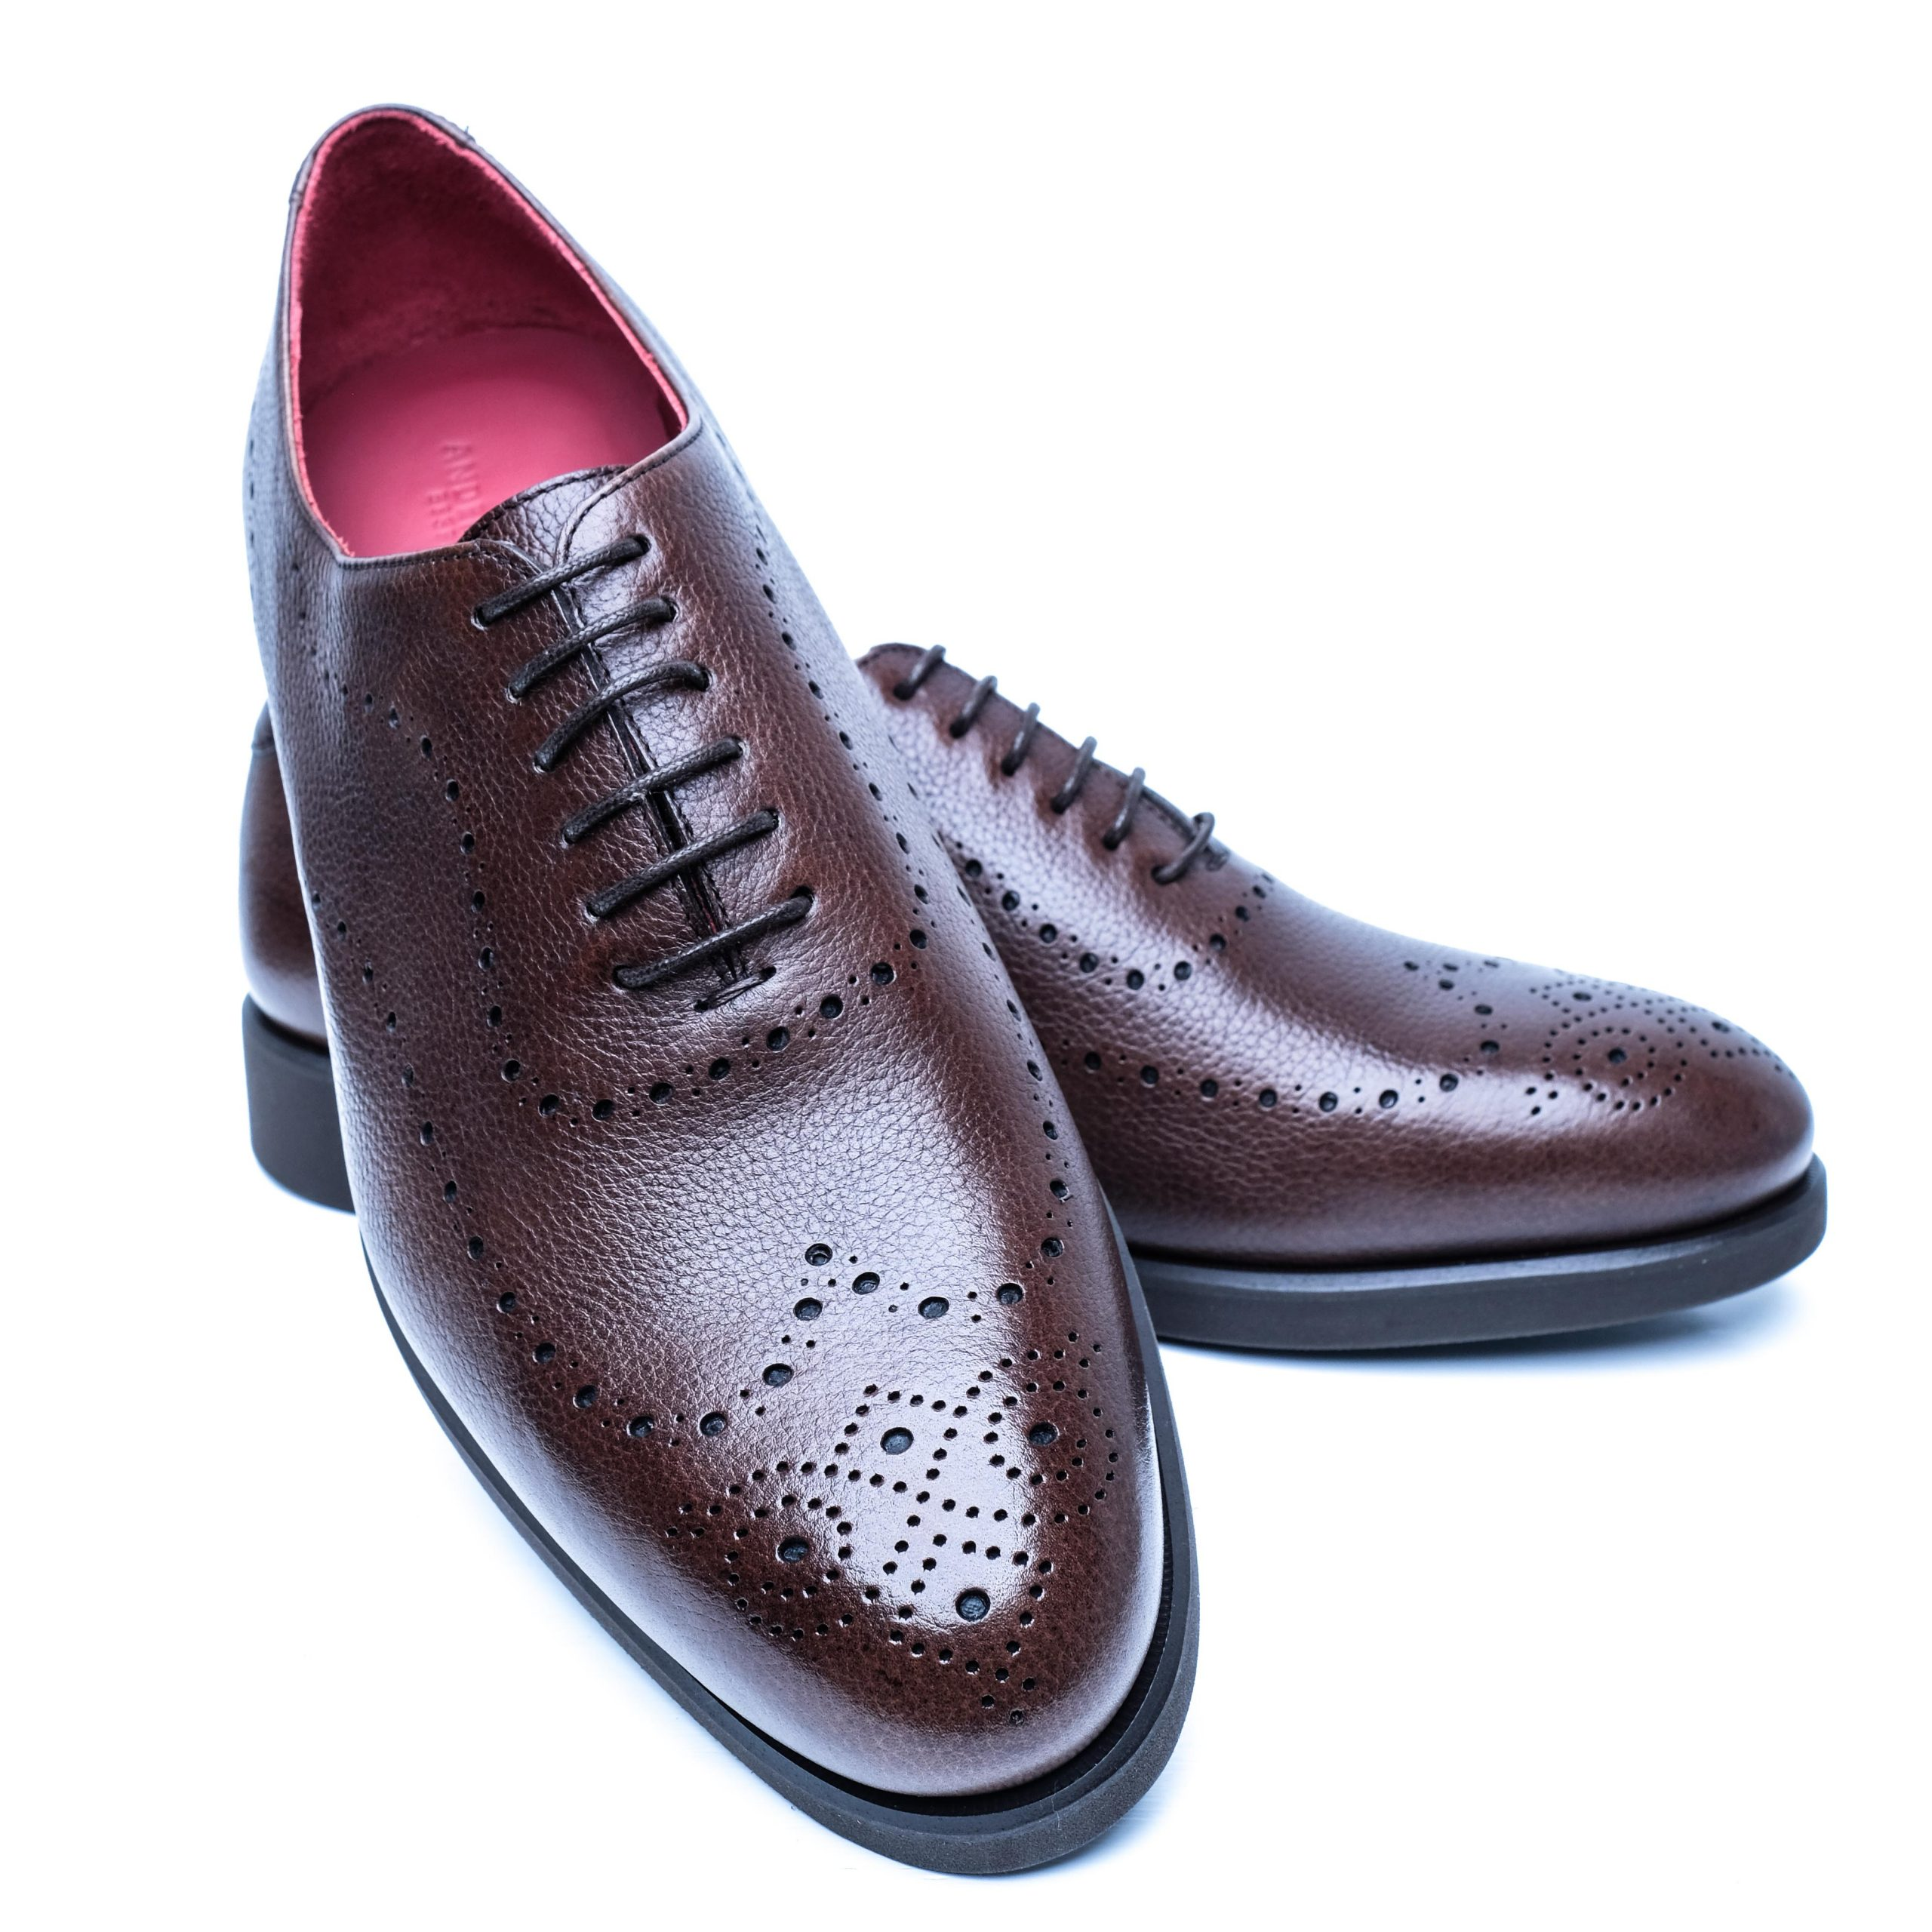 Custom Bespoke Full Brogue Mens Shoes - Wide Width